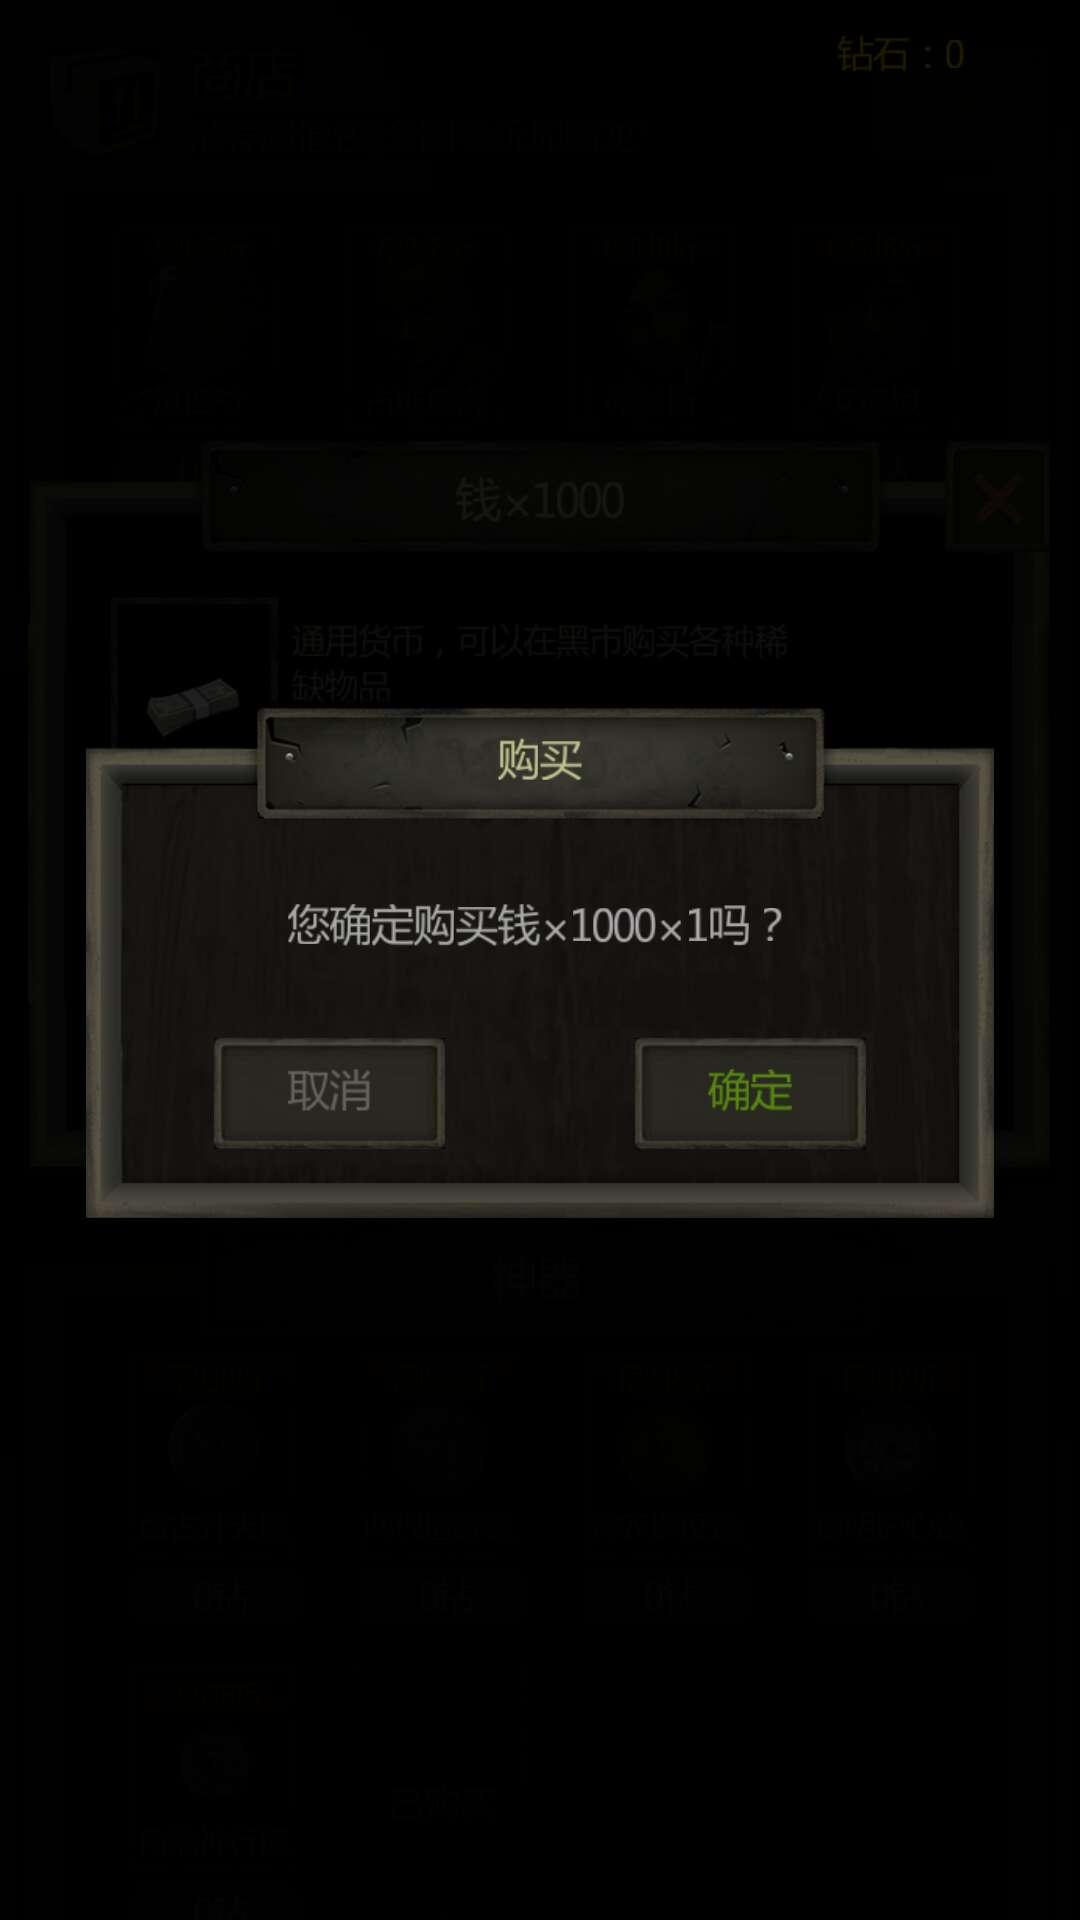 【原创】长生劫v_19.7.26.1404-www.im86.com